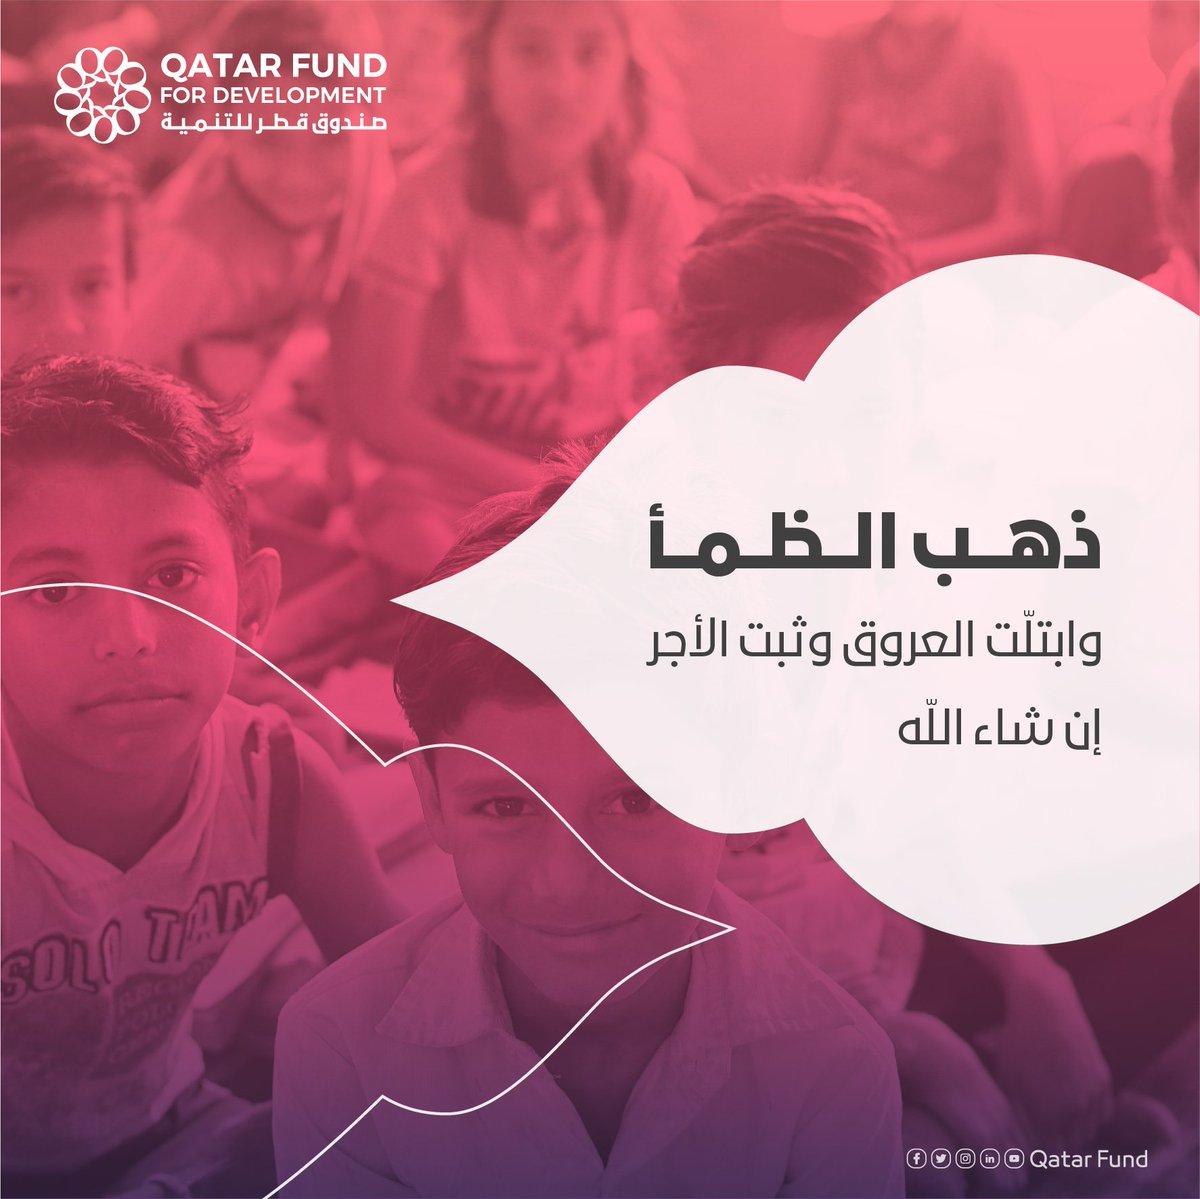 Qatar Fund For Development صندوق قطر للتنمية On Twitter دعاء الافطار ذهب الظمأ وابتلت العروق وثبت الأجر إن شاء الله Qffd رمضان